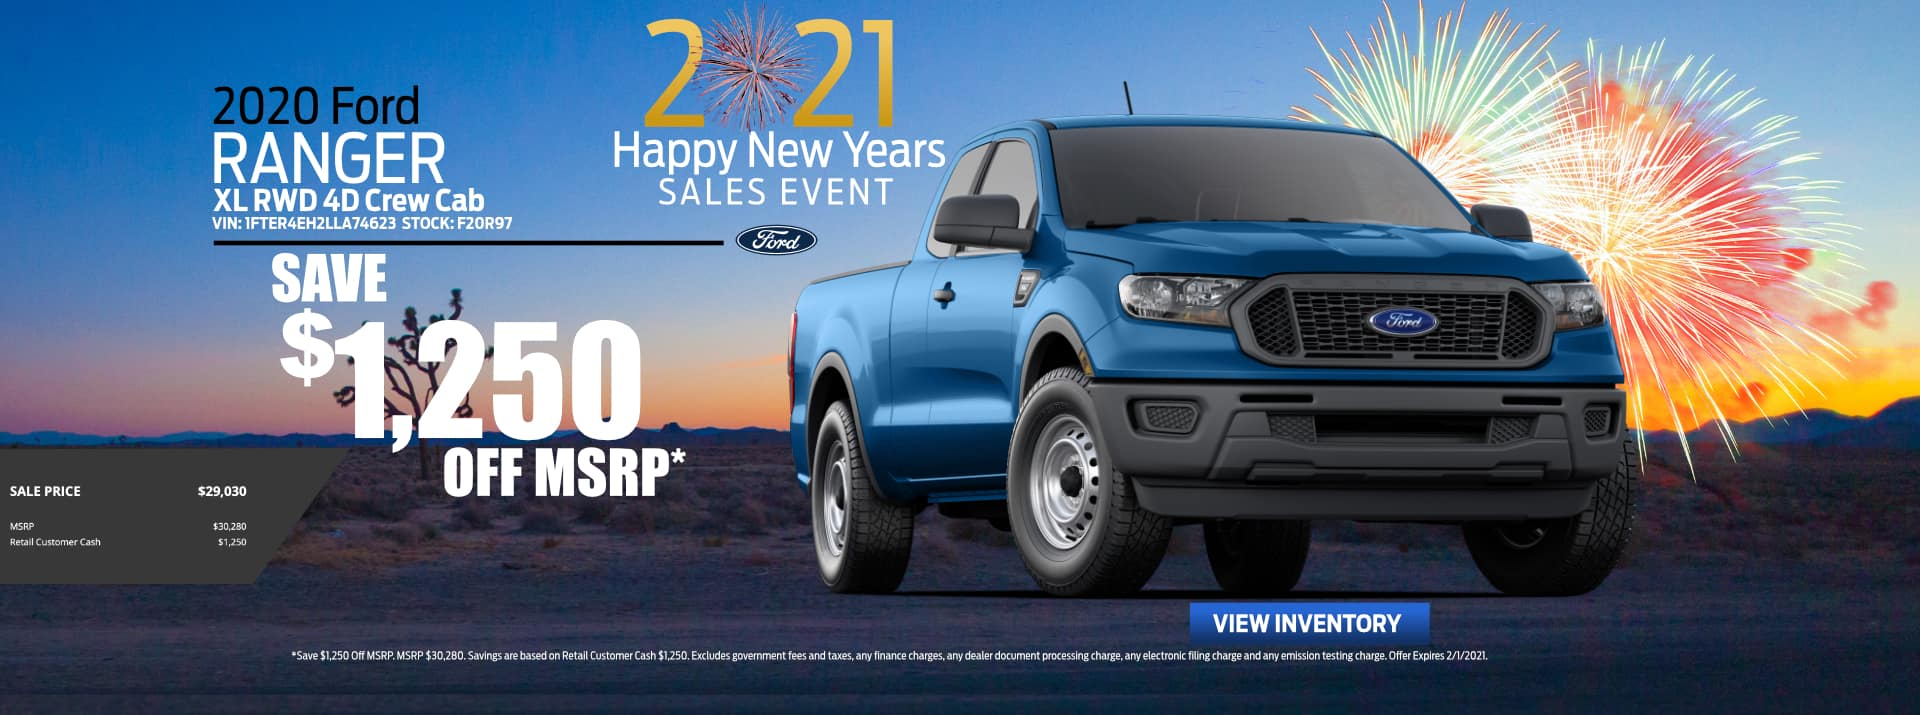 Revised_January-2021 Ford Ranger Fiesta Ford